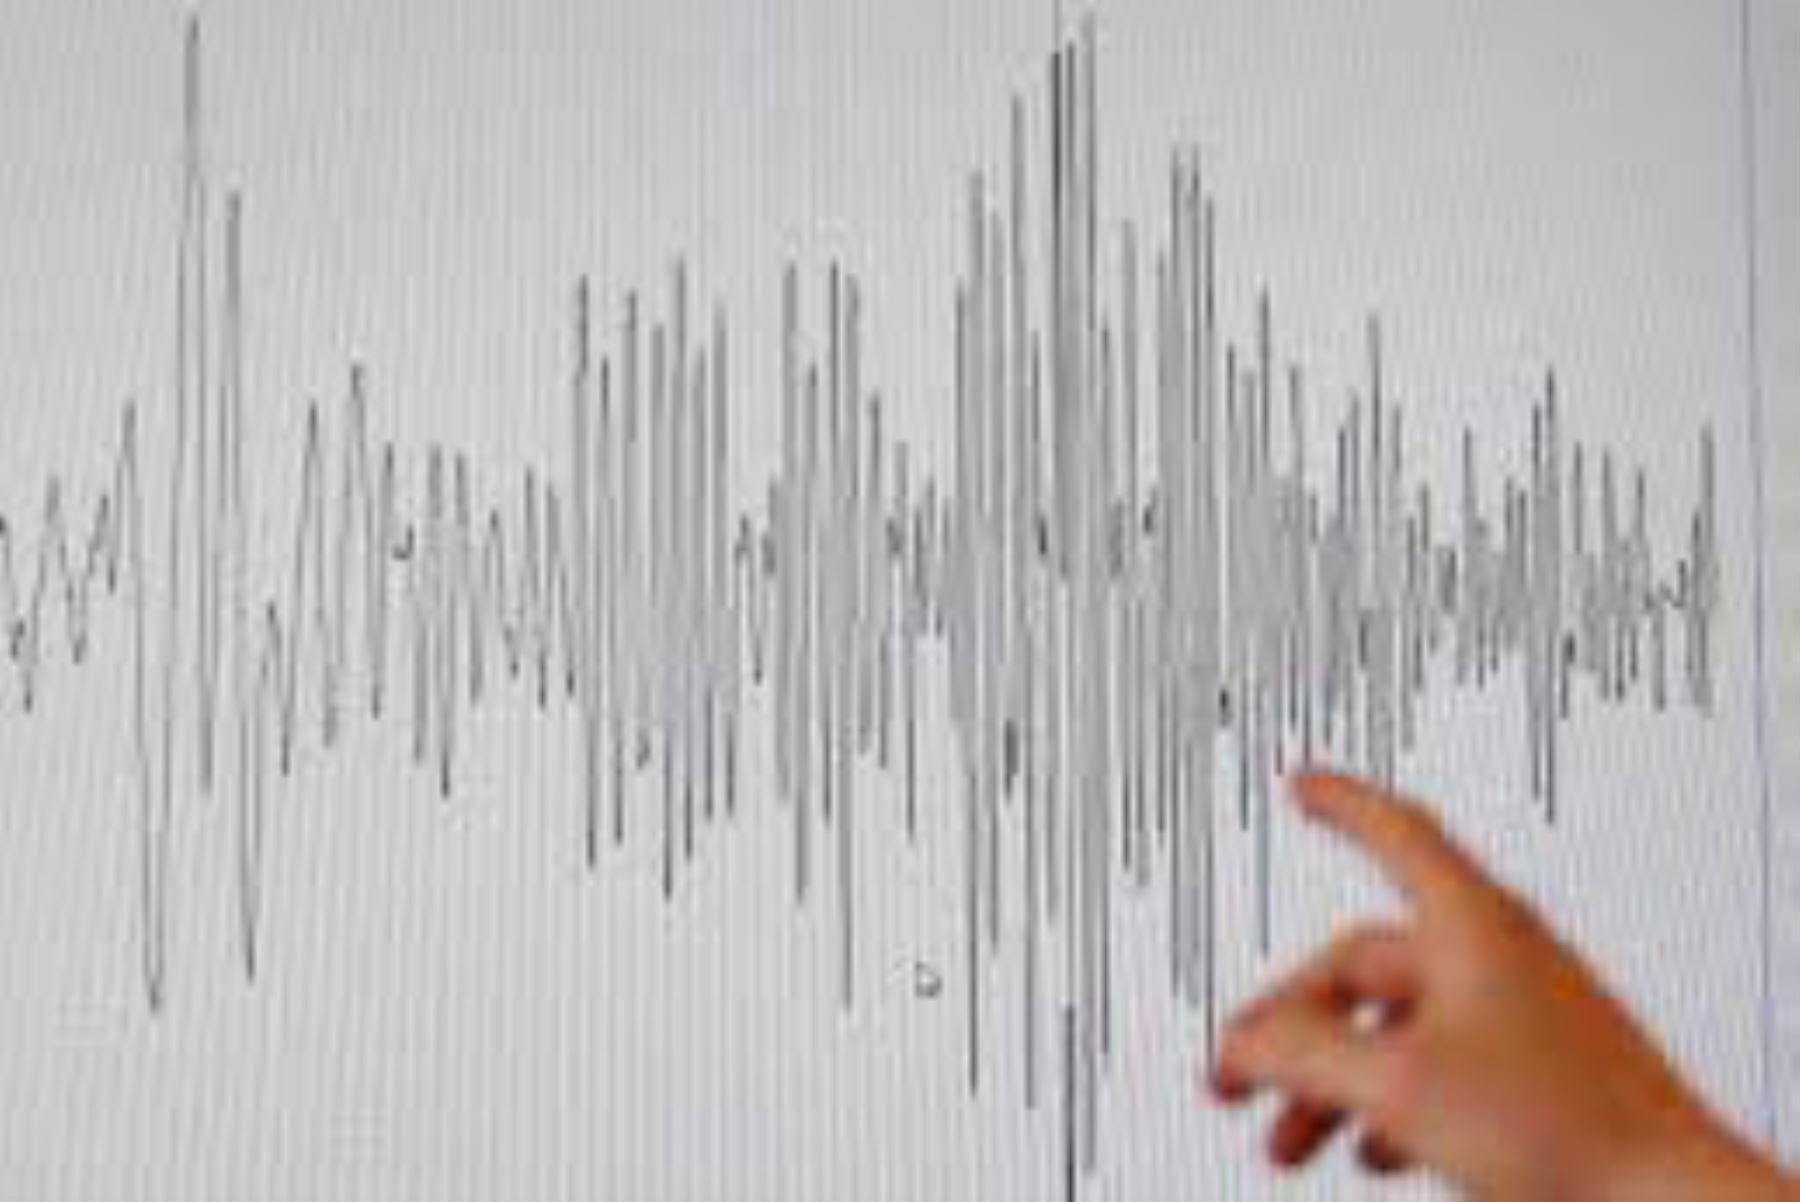 Temblor de 4.3 sacudió la madrugada de Lima